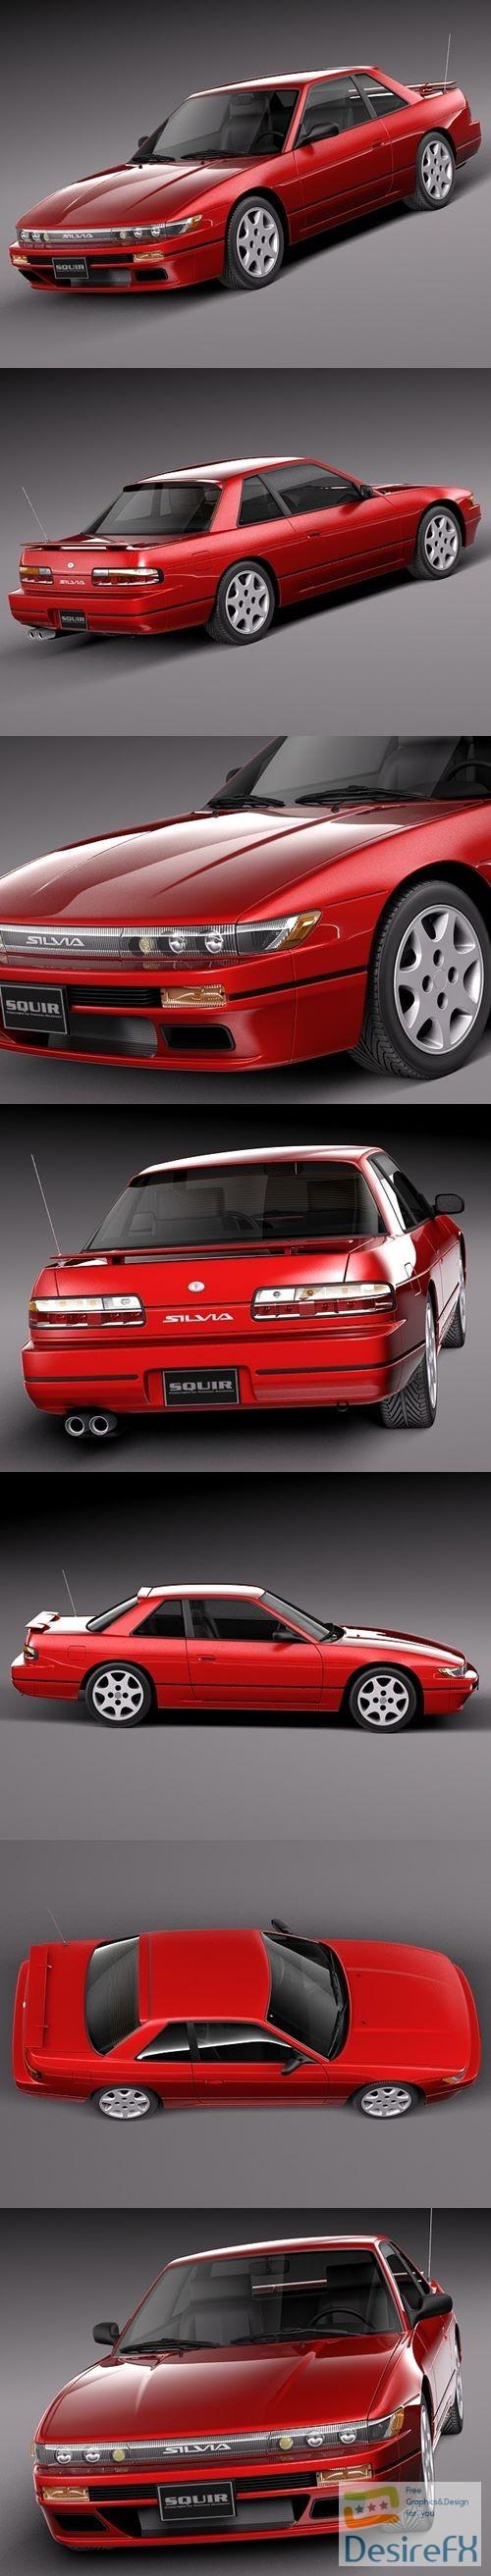 Nissan Silvia K S13 1989-1994 3D Model